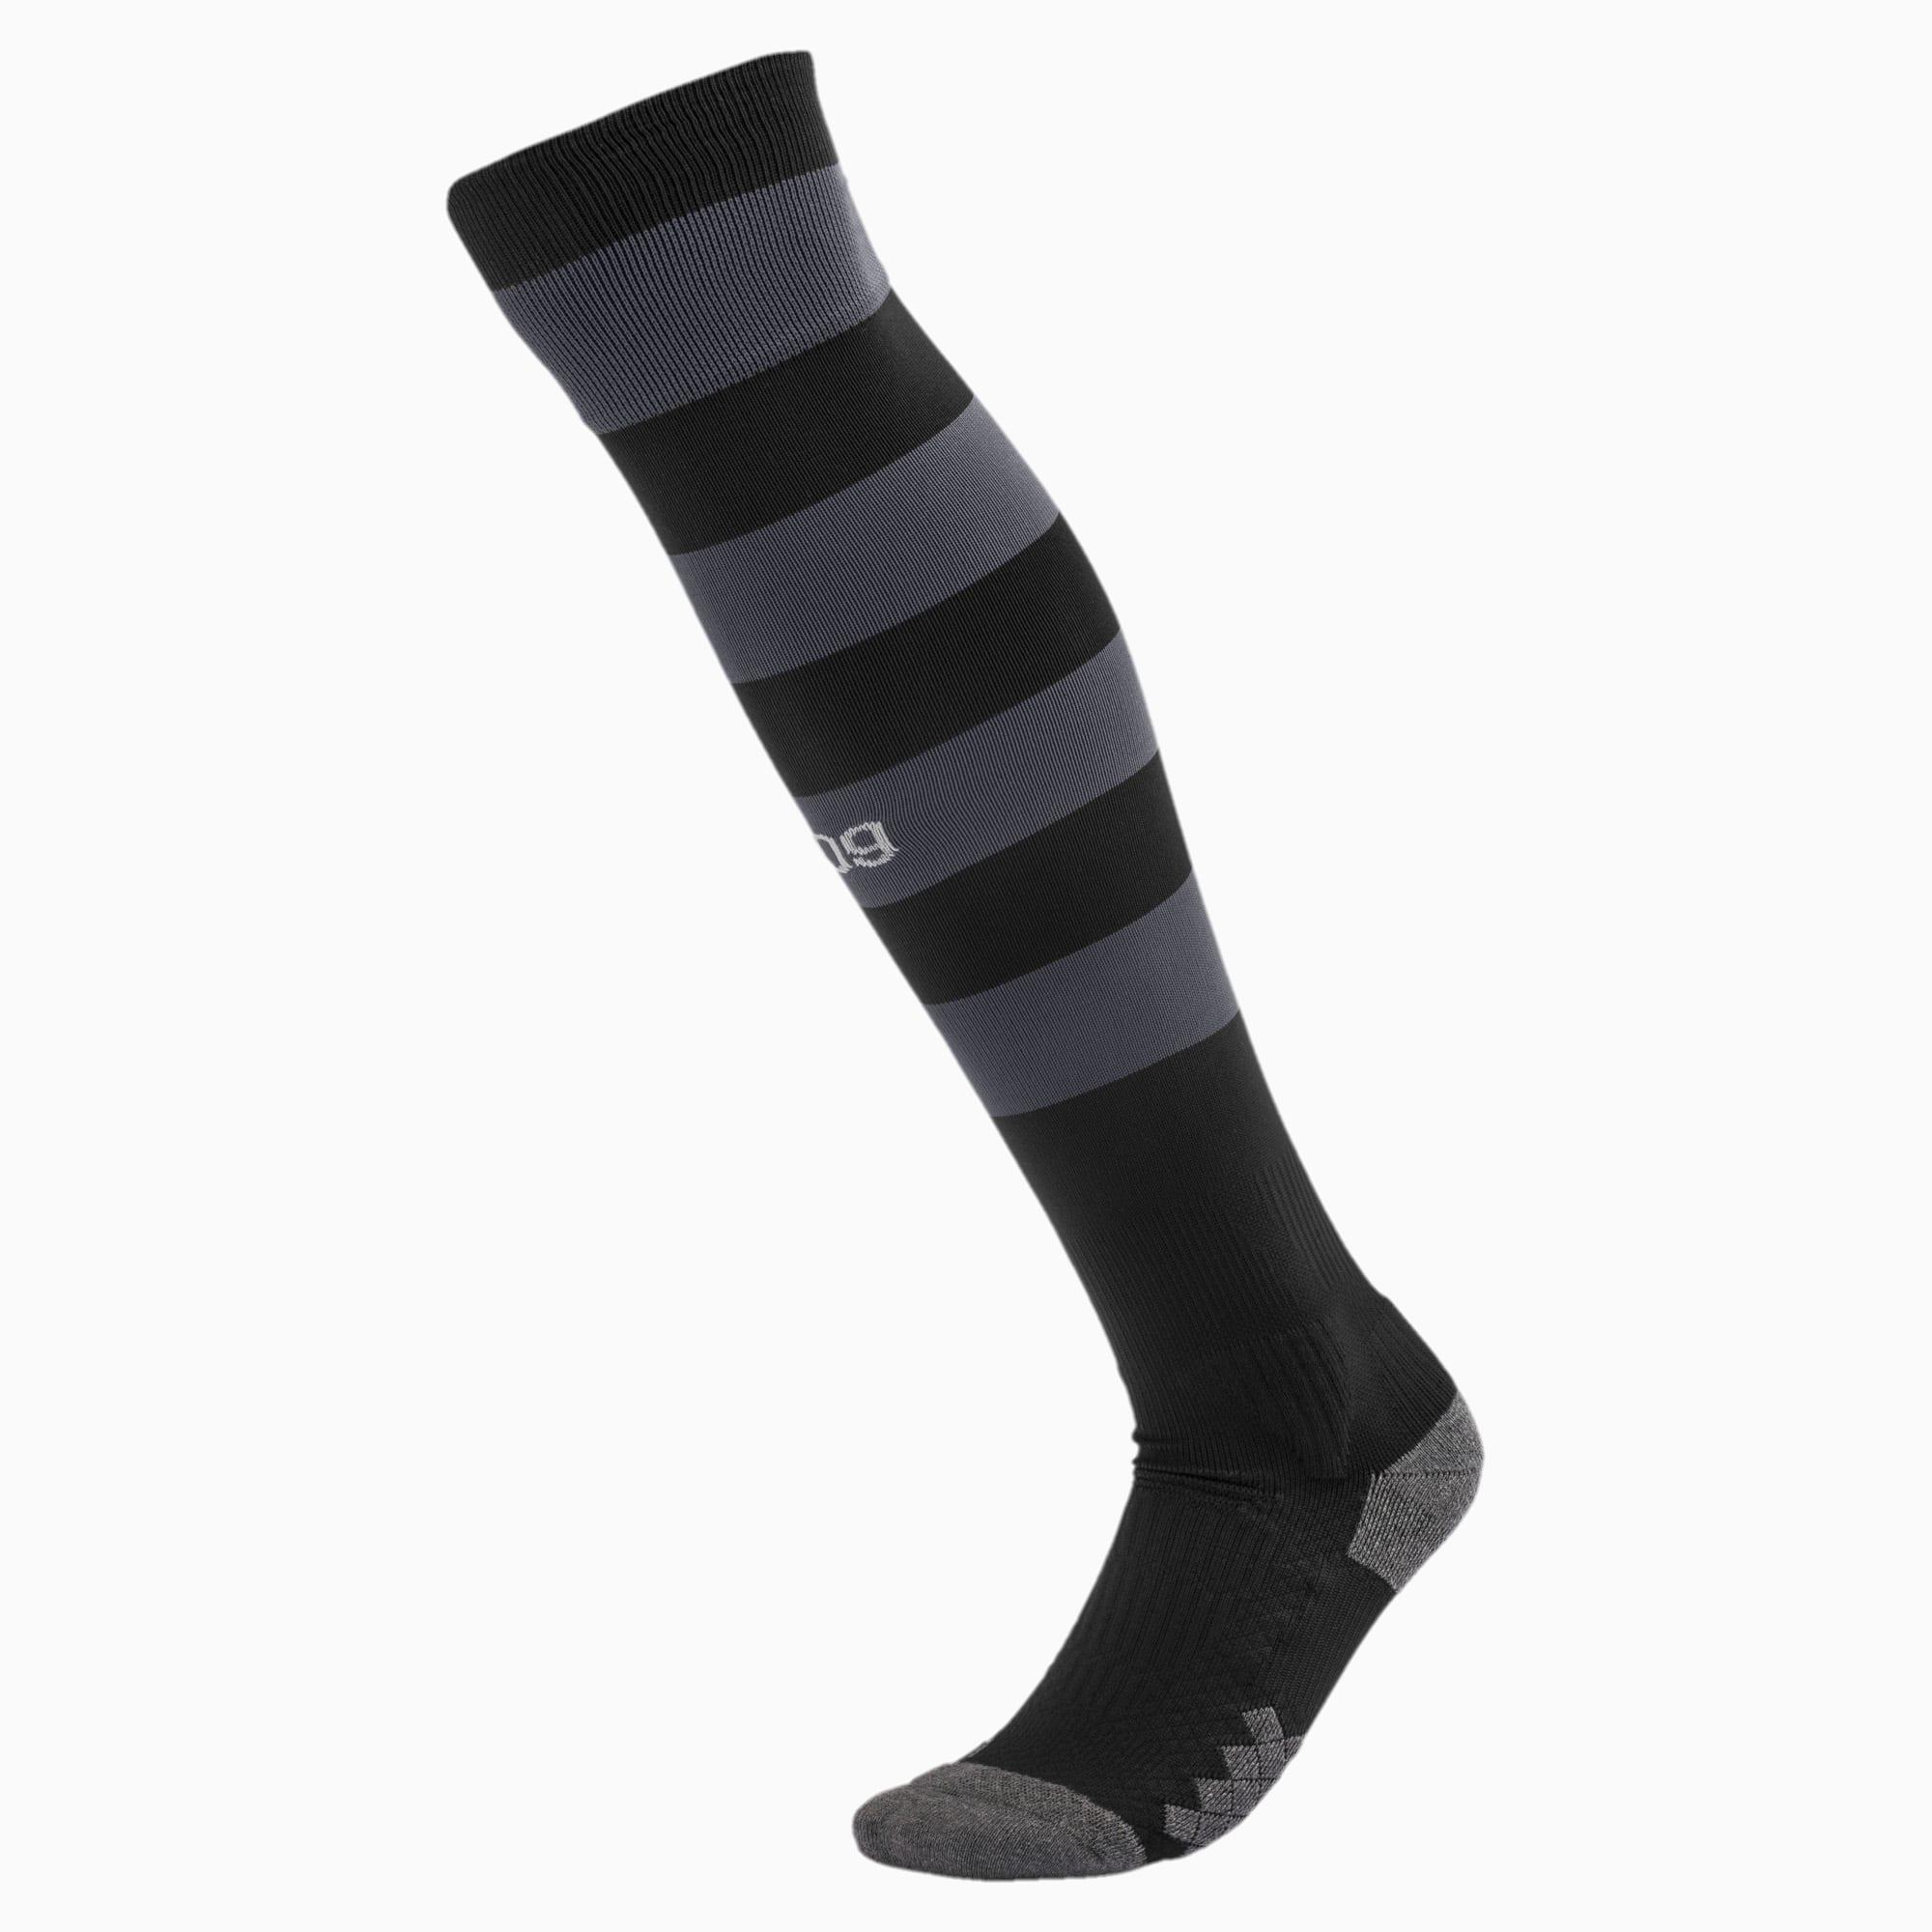 PUMA Chaussure Chaussettes rayées BVB pour Homme, Noir, Taille 43-46, Chaussures